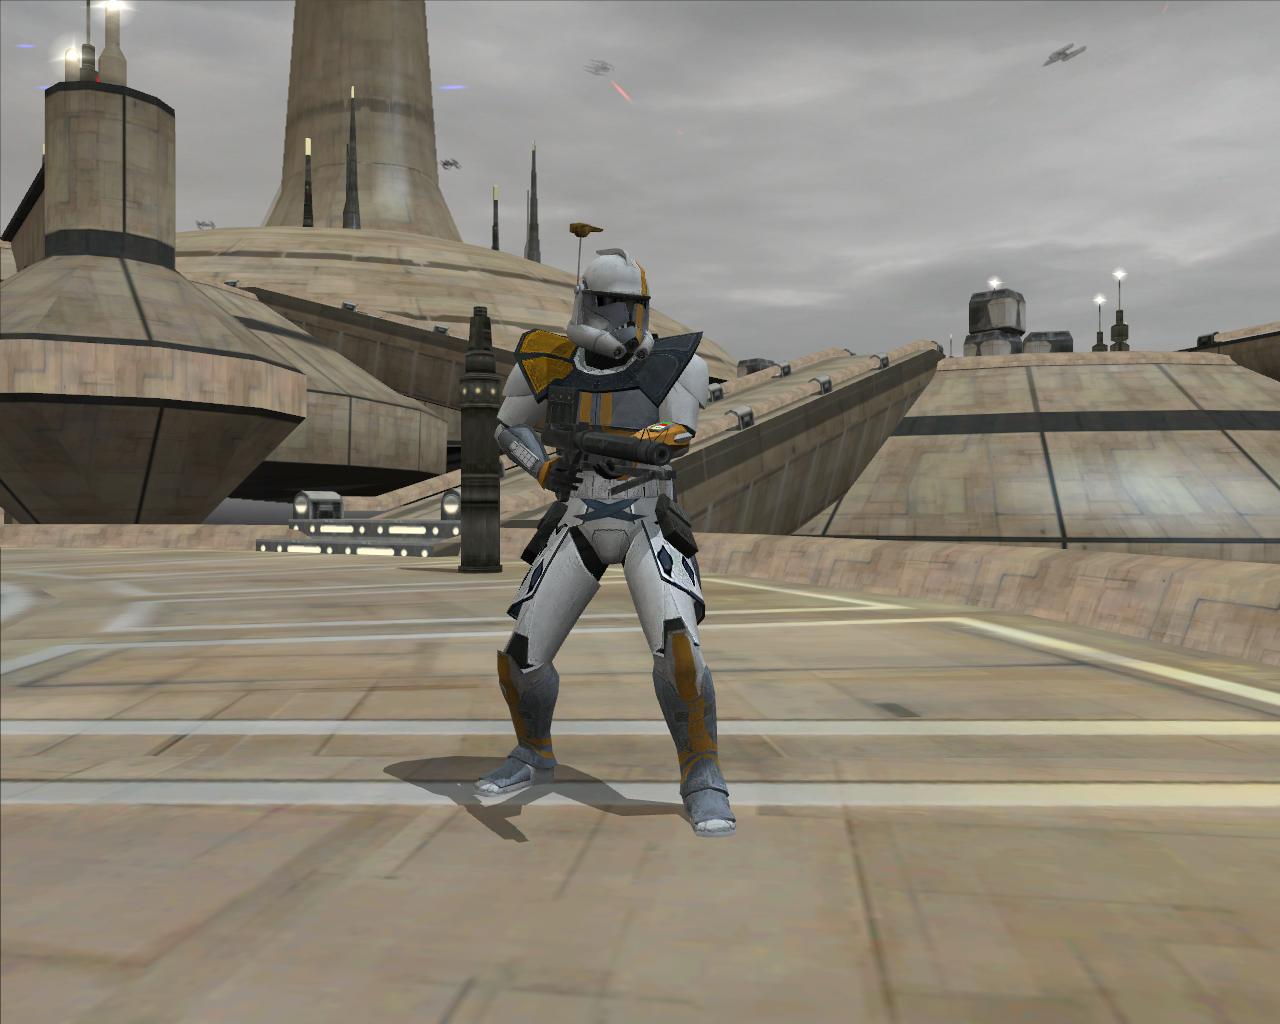 screenshot 0008 1